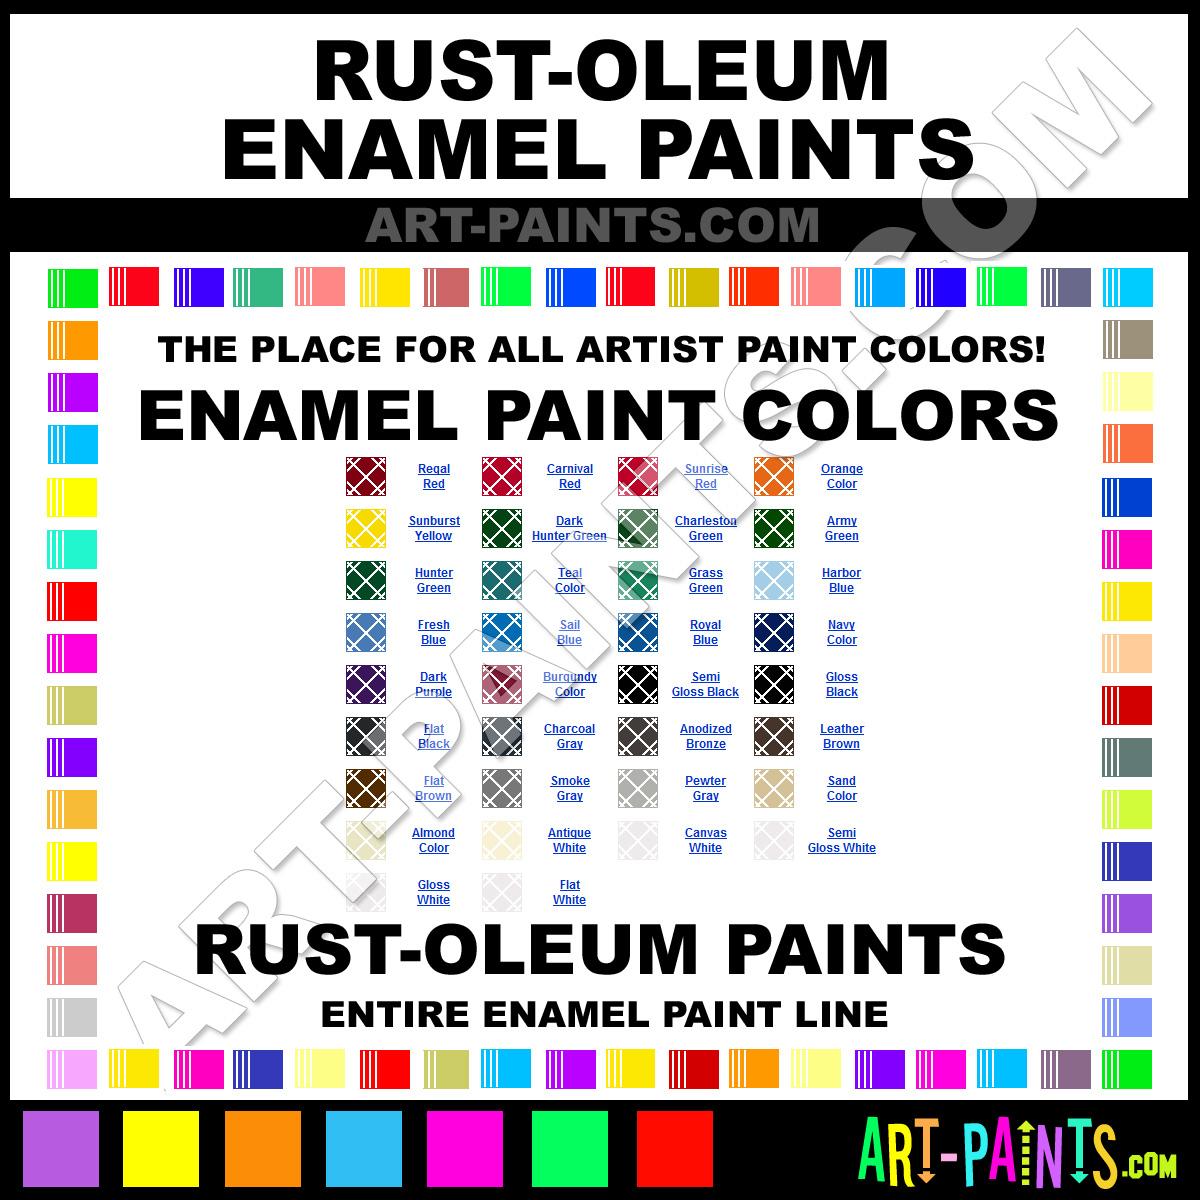 Rust oleum enamel paint brands rust oleum paint brands enamel rust oleum enamel paints rust oleum paints nvjuhfo Choice Image